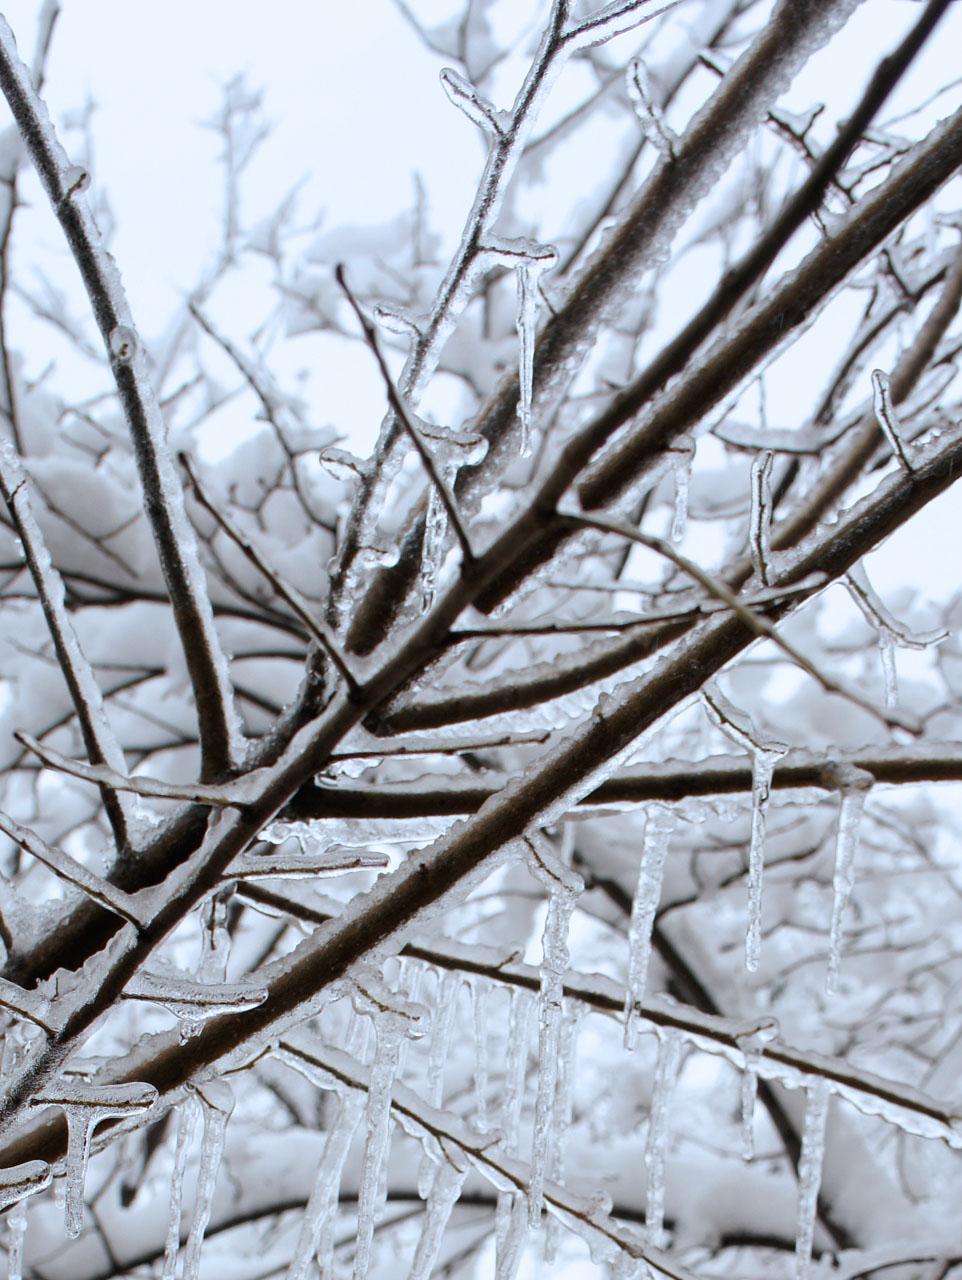 Snow on branches 2s キルギスの冬の朝